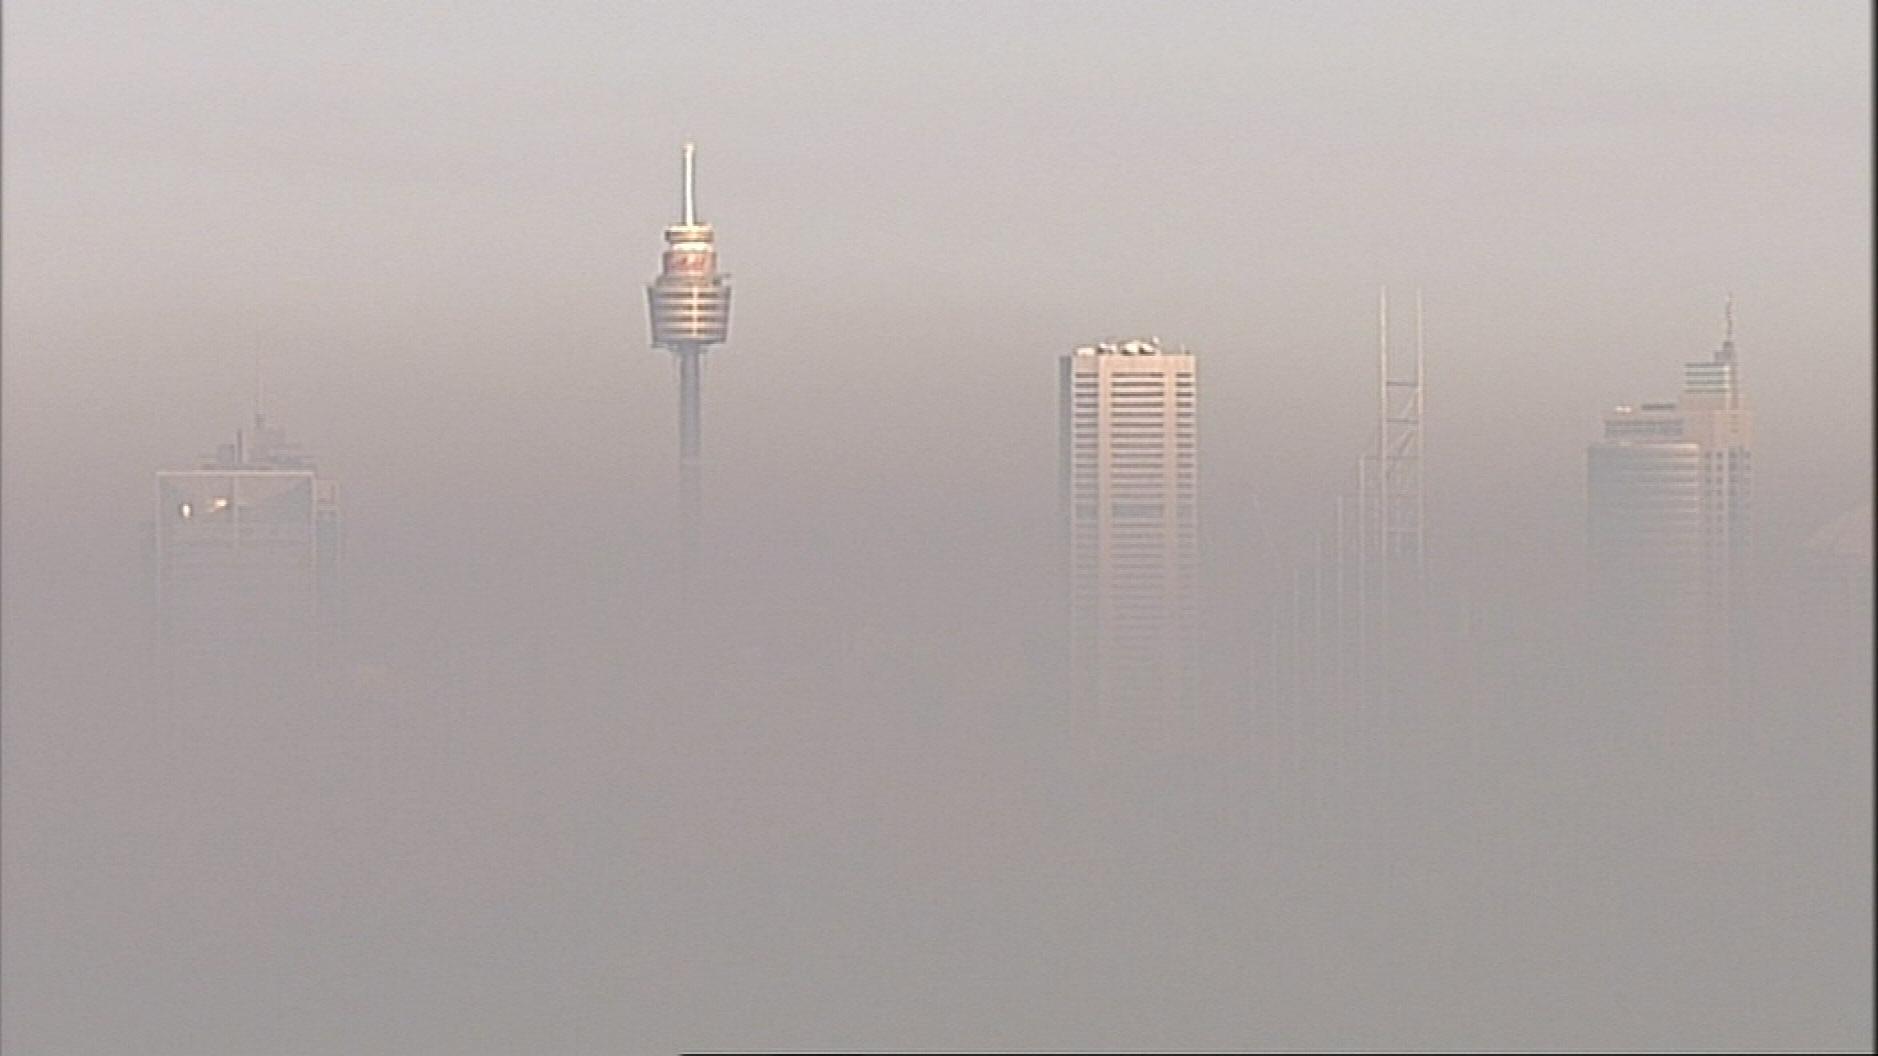 Sydney air pollution levels spark alarm, warnings